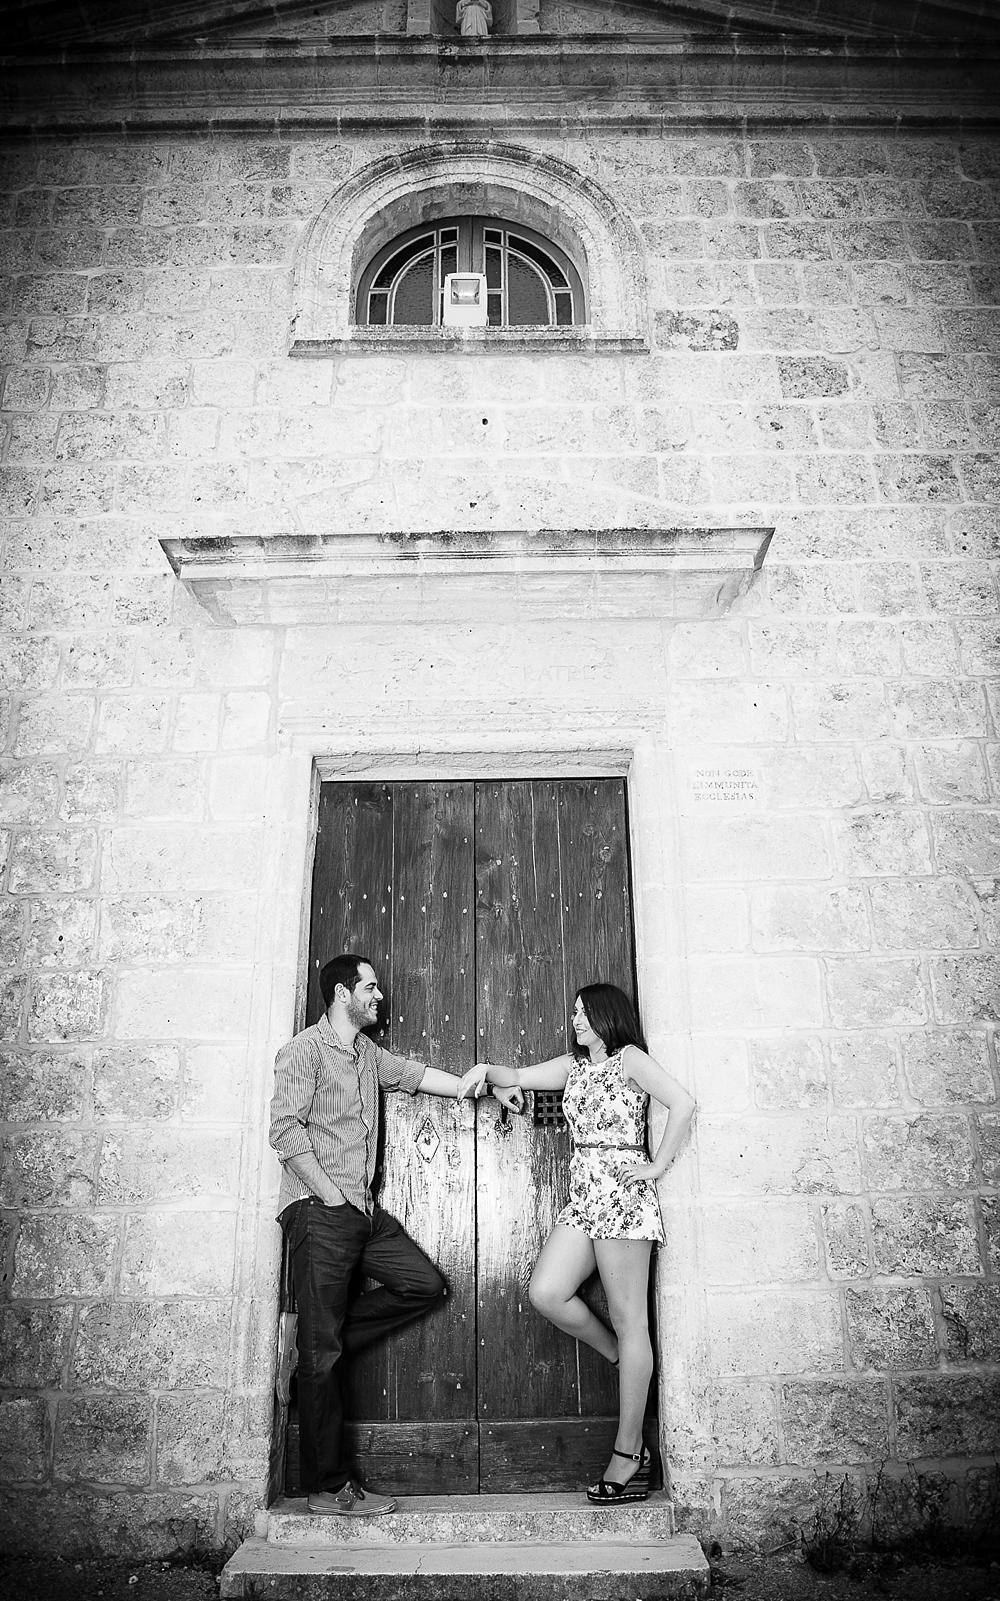 More images form Doreen & Karl's wedding on the blog...http://www.shanepwatts.com/blog/doreen-karl-razzett-lantik  Shane P. Watts Photography